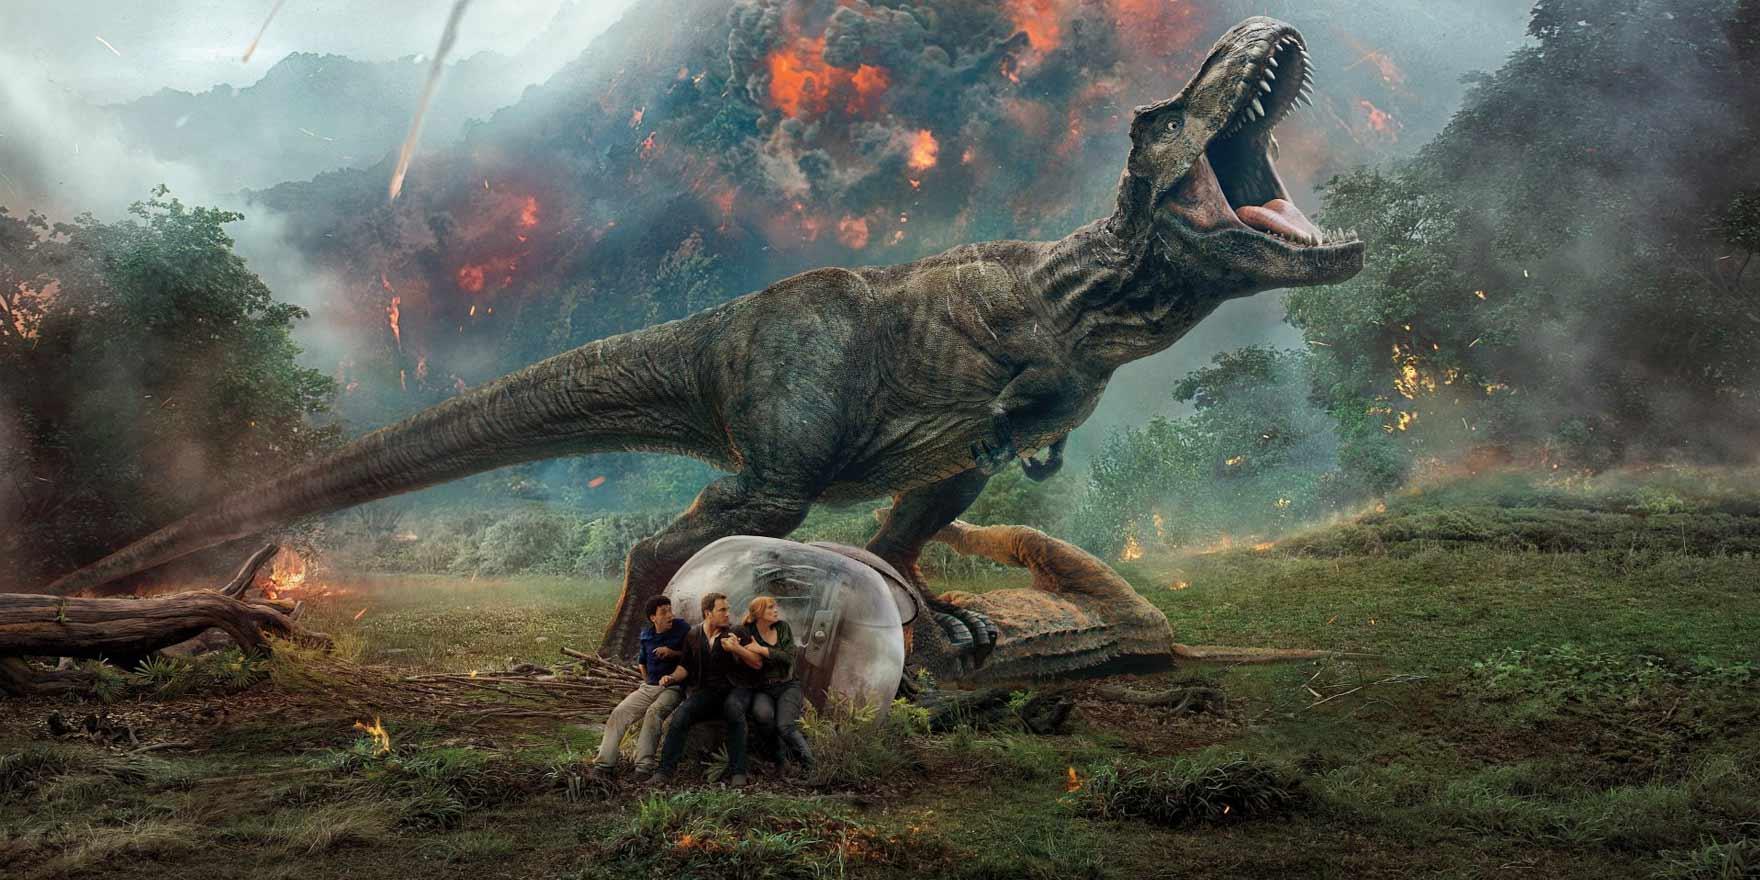 Jurassic World: Fallen Kingdom - Header Image